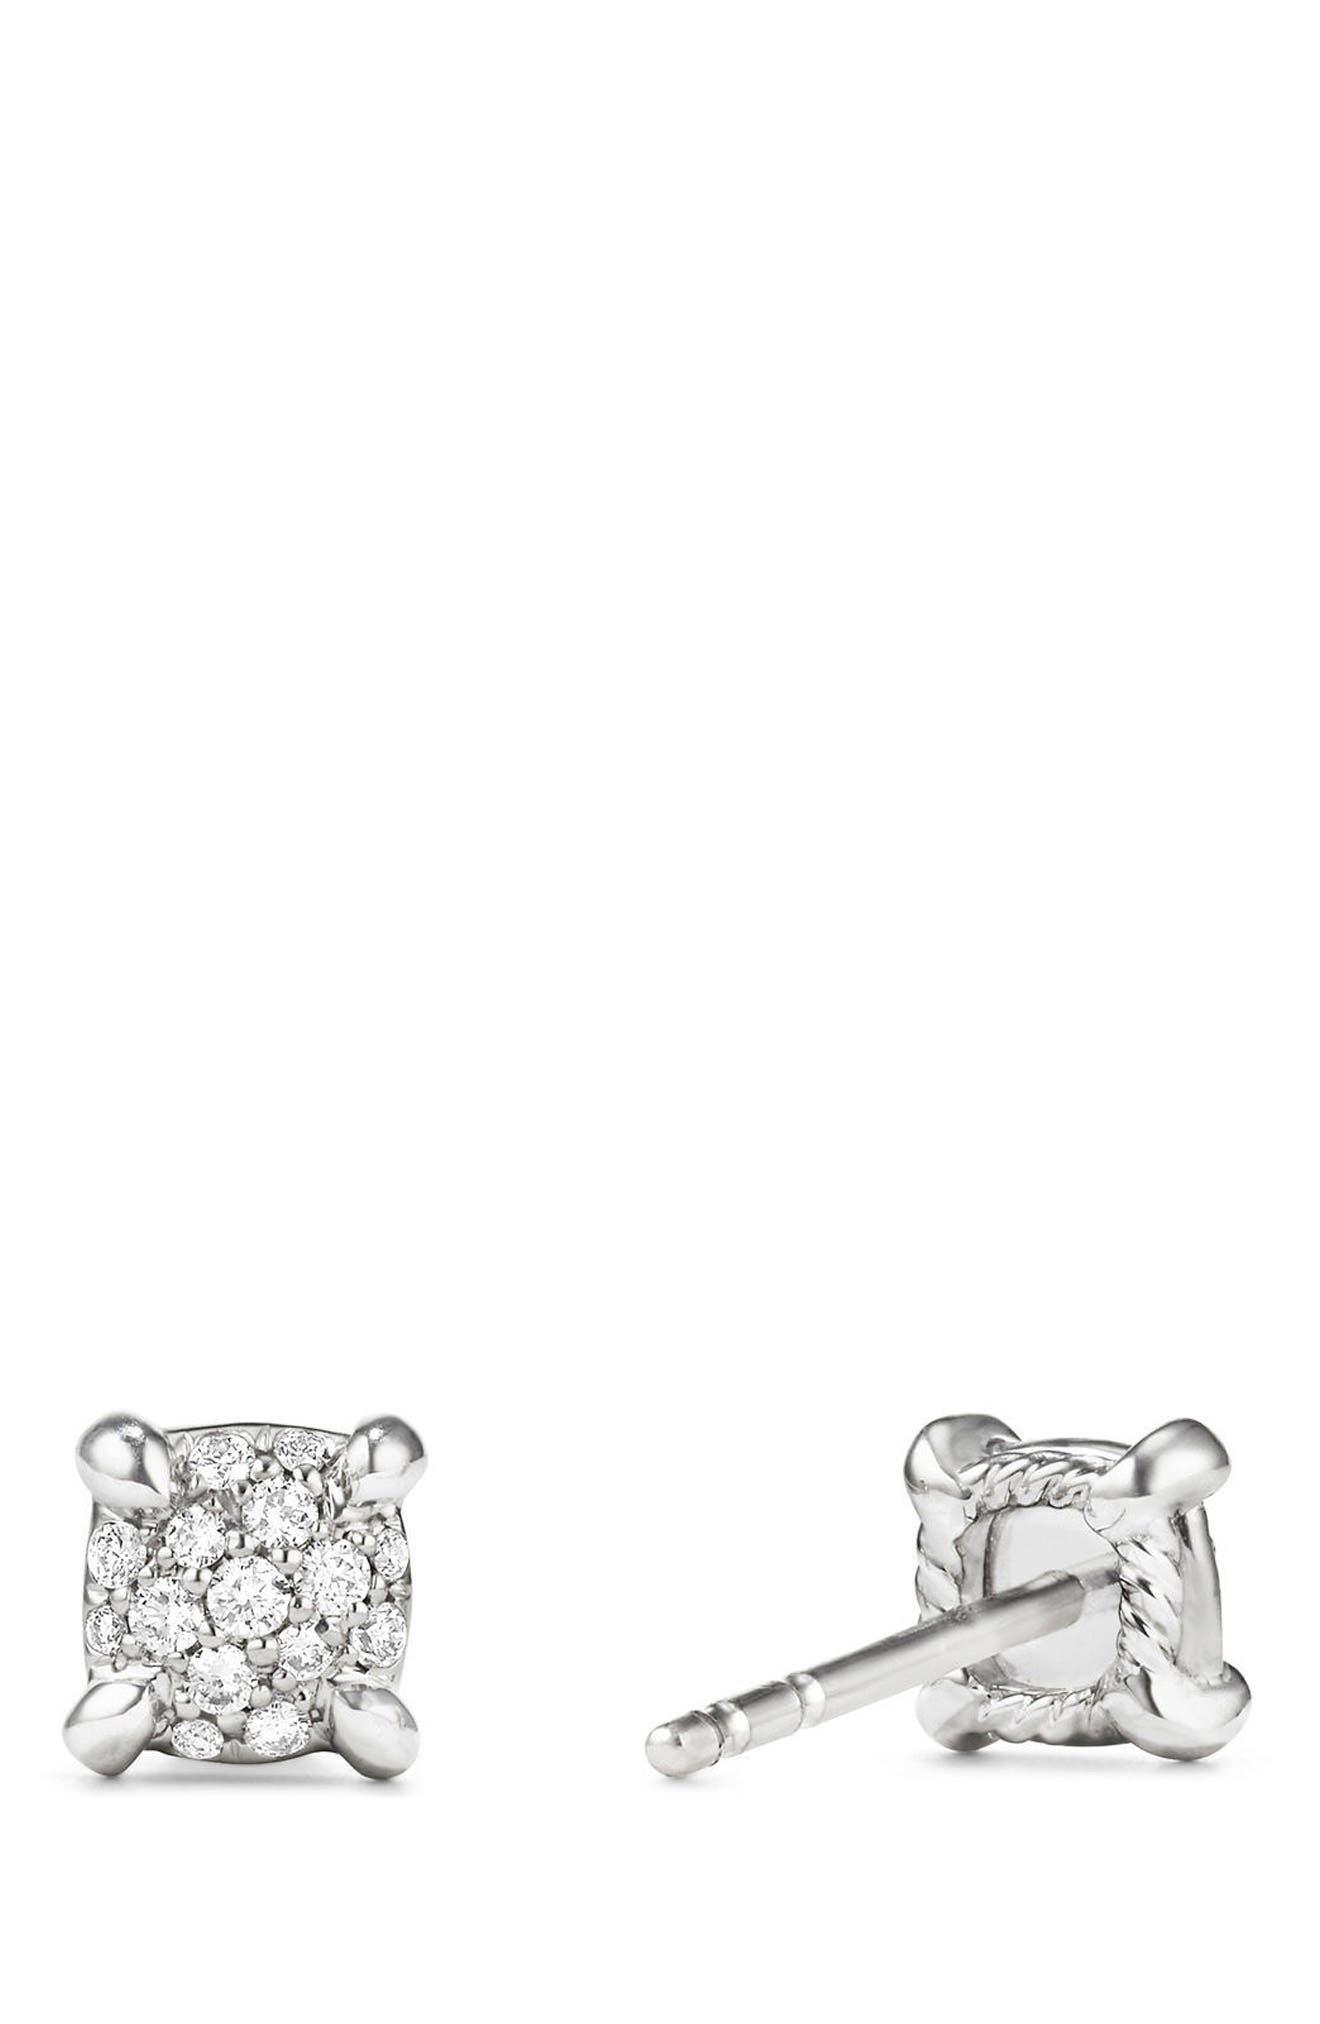 DAVID YURMAN, Châtelaine Stud Earrings with Diamonds, Alternate thumbnail 2, color, WHITE GOLD/ DIAMOND